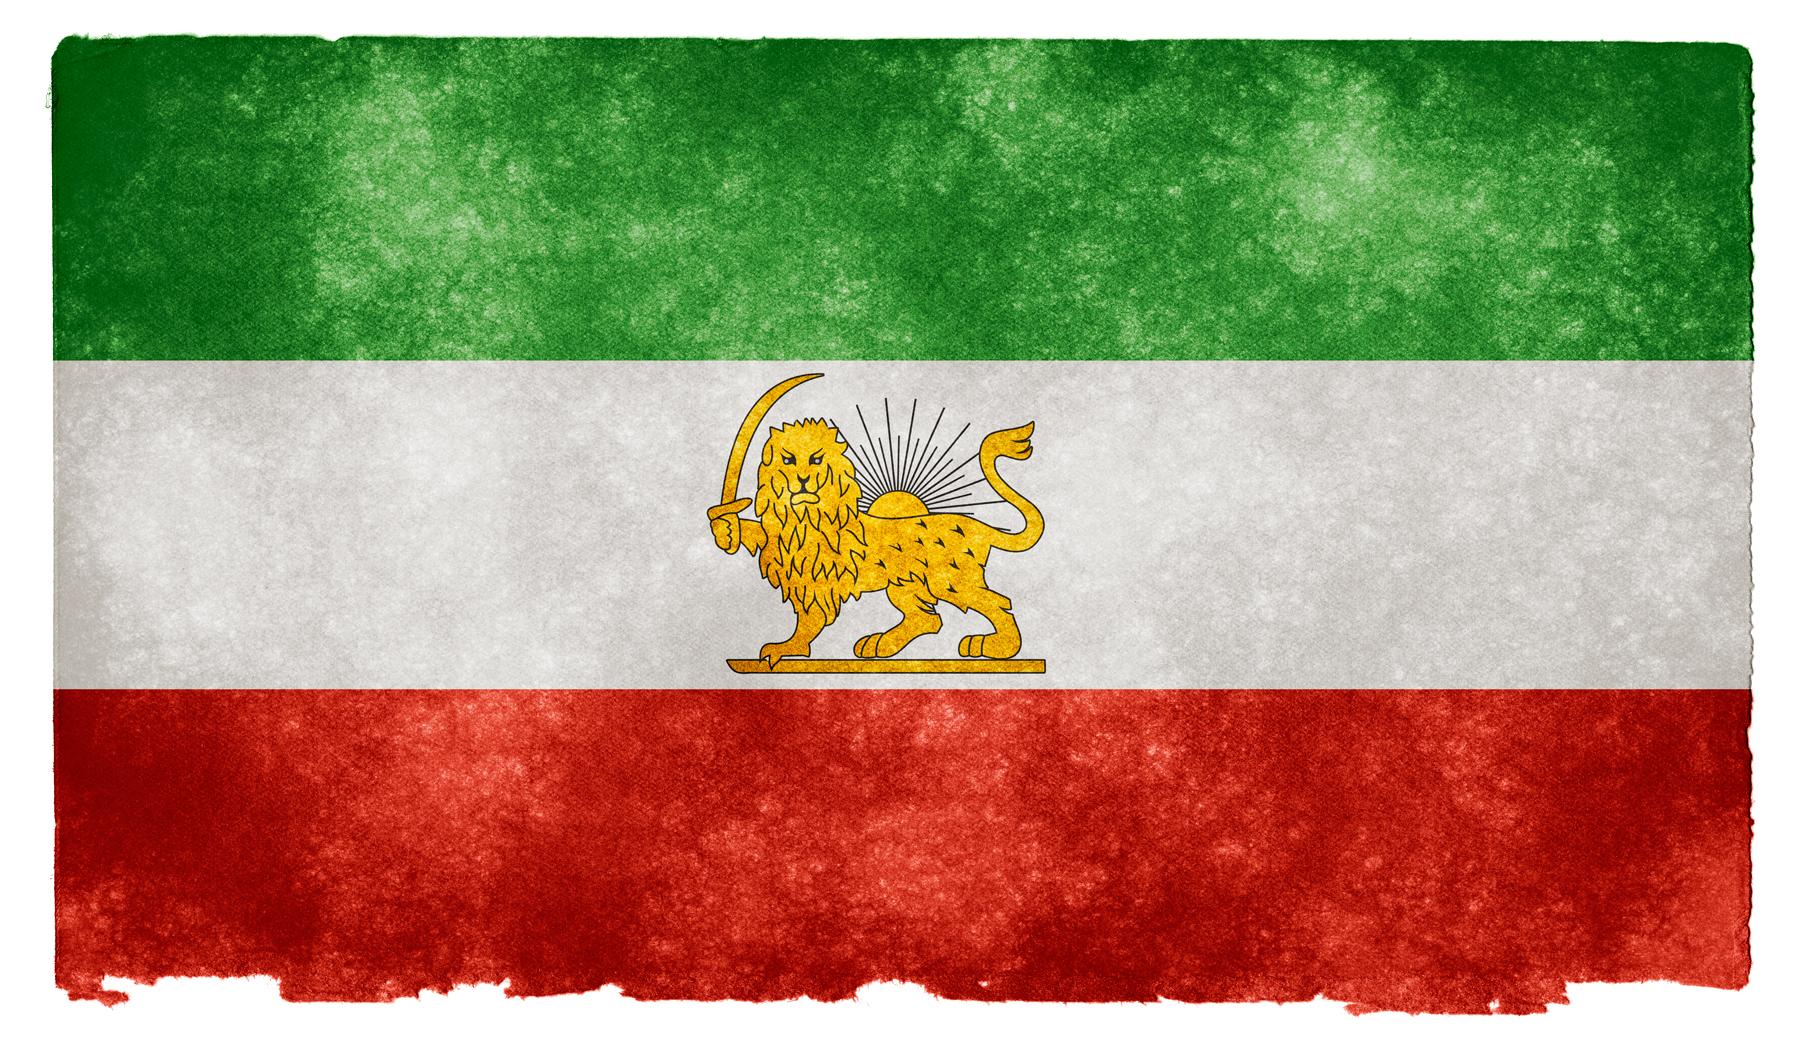 Iran shah grunge flag photo